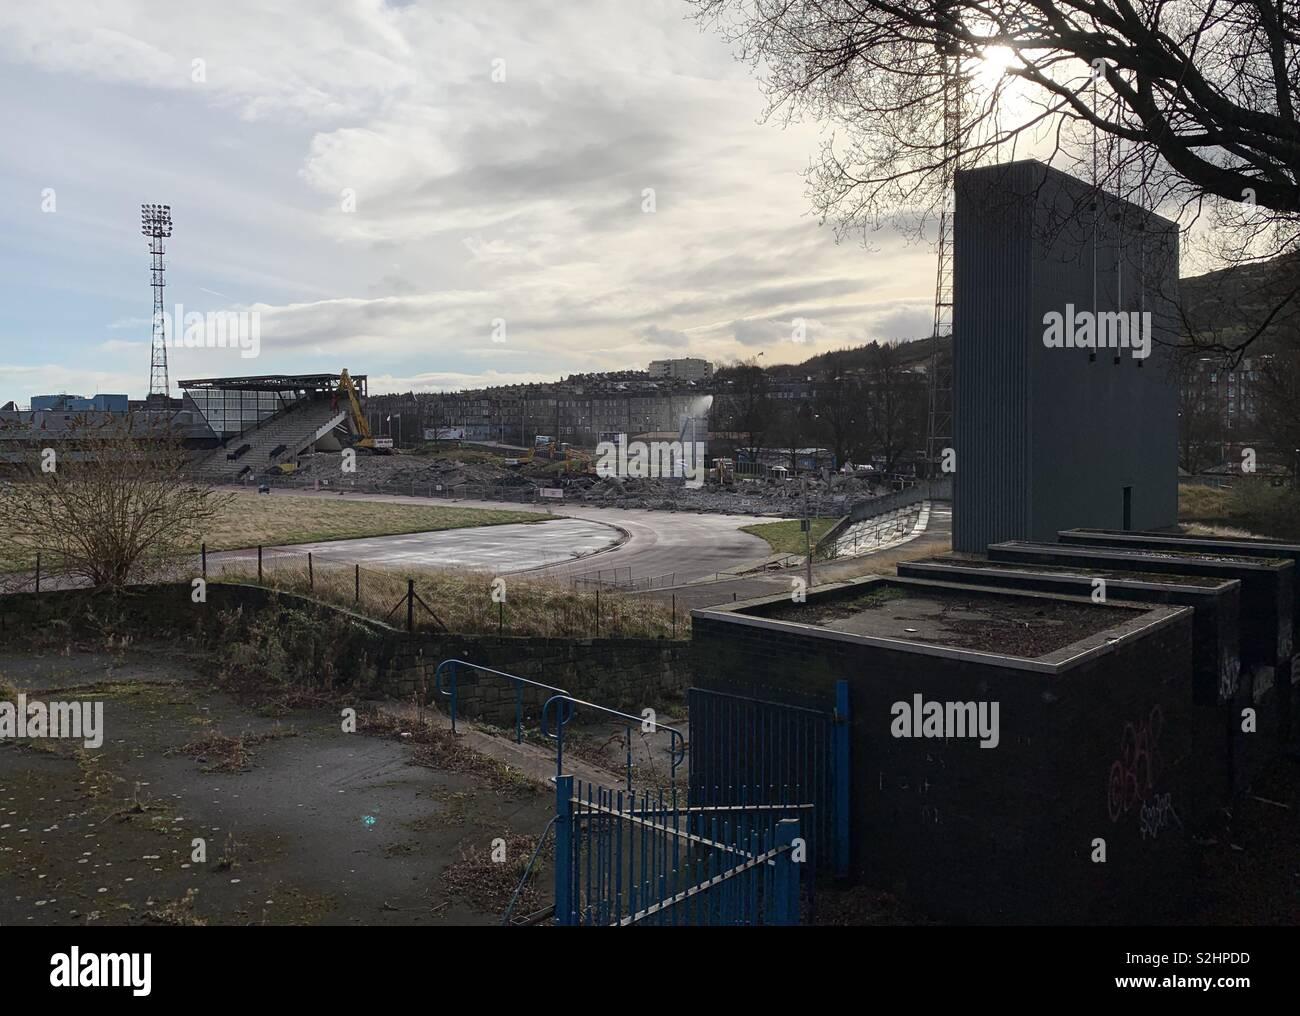 Tuesday 19th of February 2019: Edinburgh, Scotland. Demolition ...